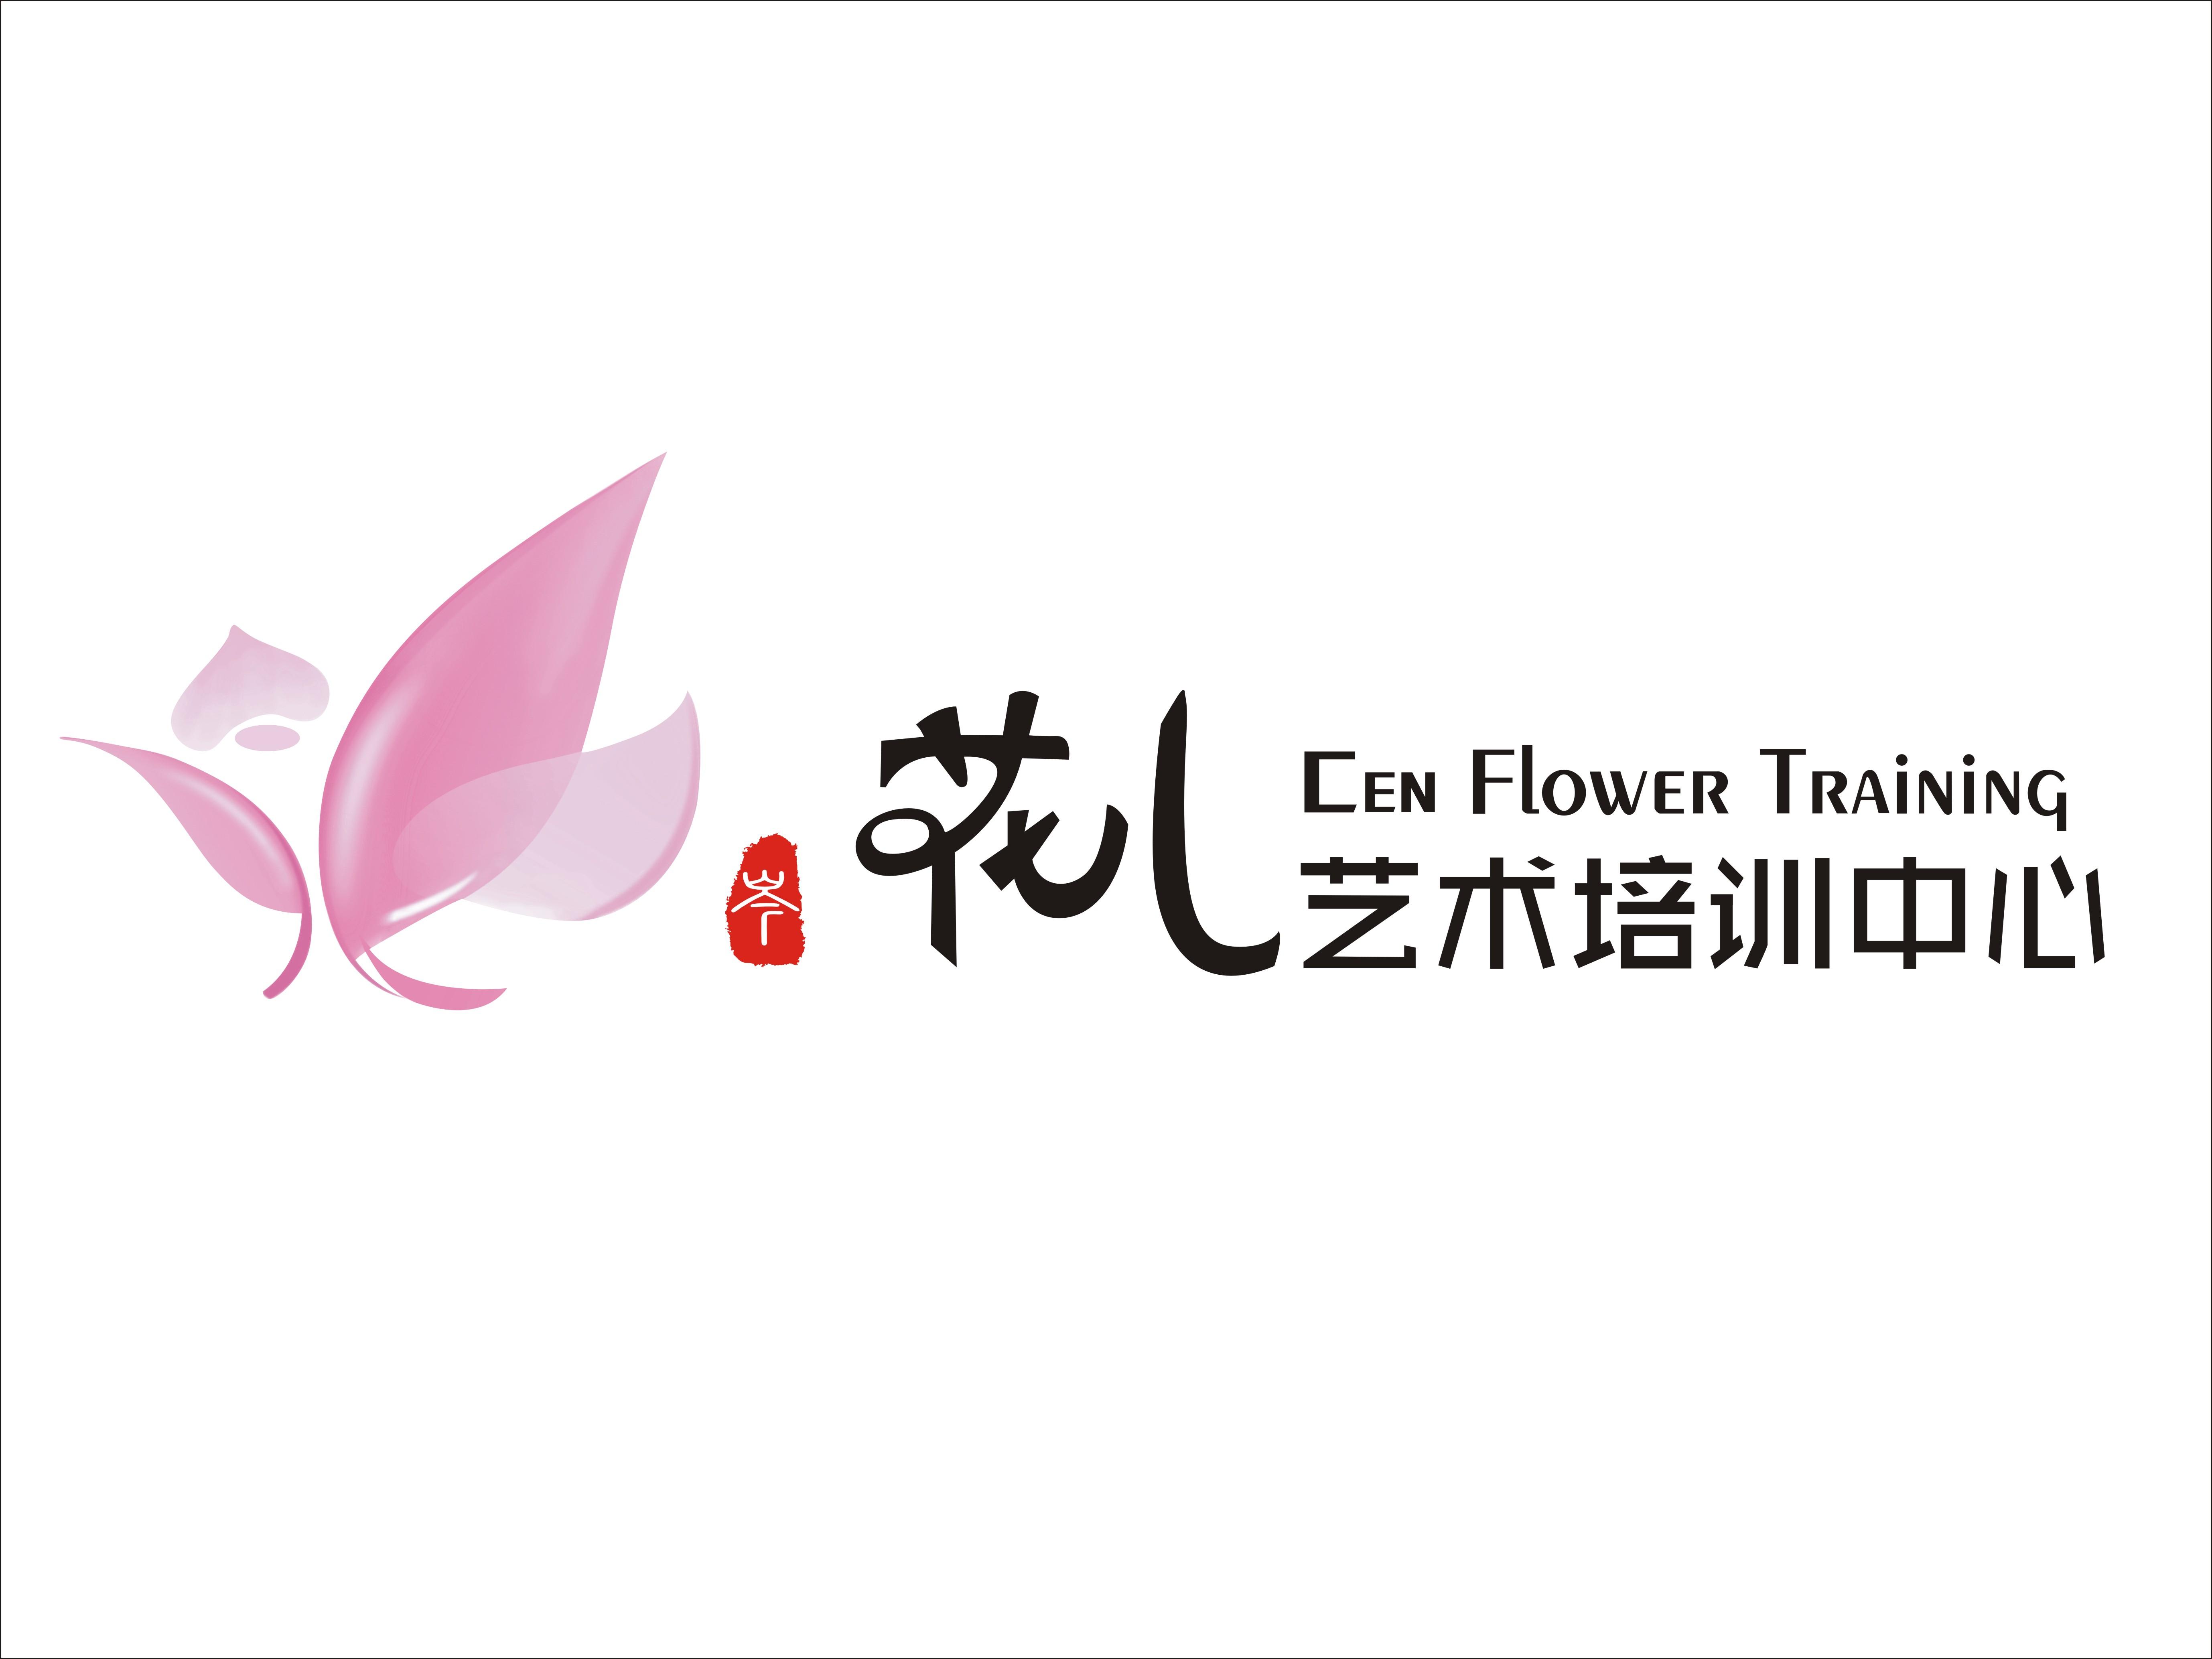 logo logo 标志 设计 图标 5514_4136